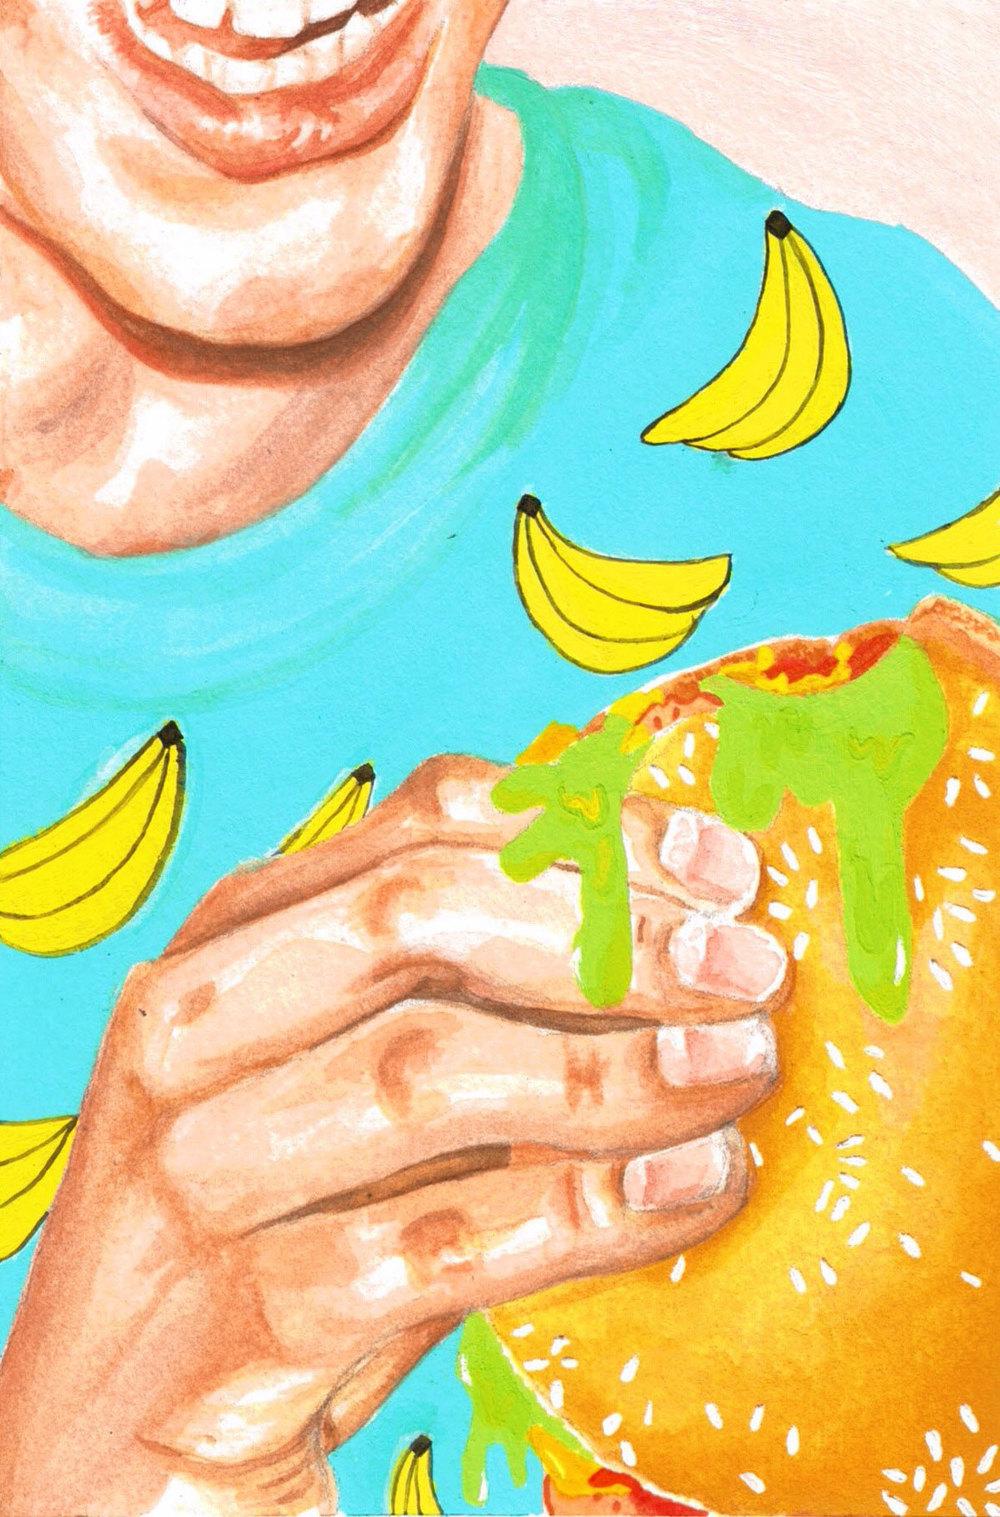 inkarrowsmag_kimwells_bananaburger.jpg